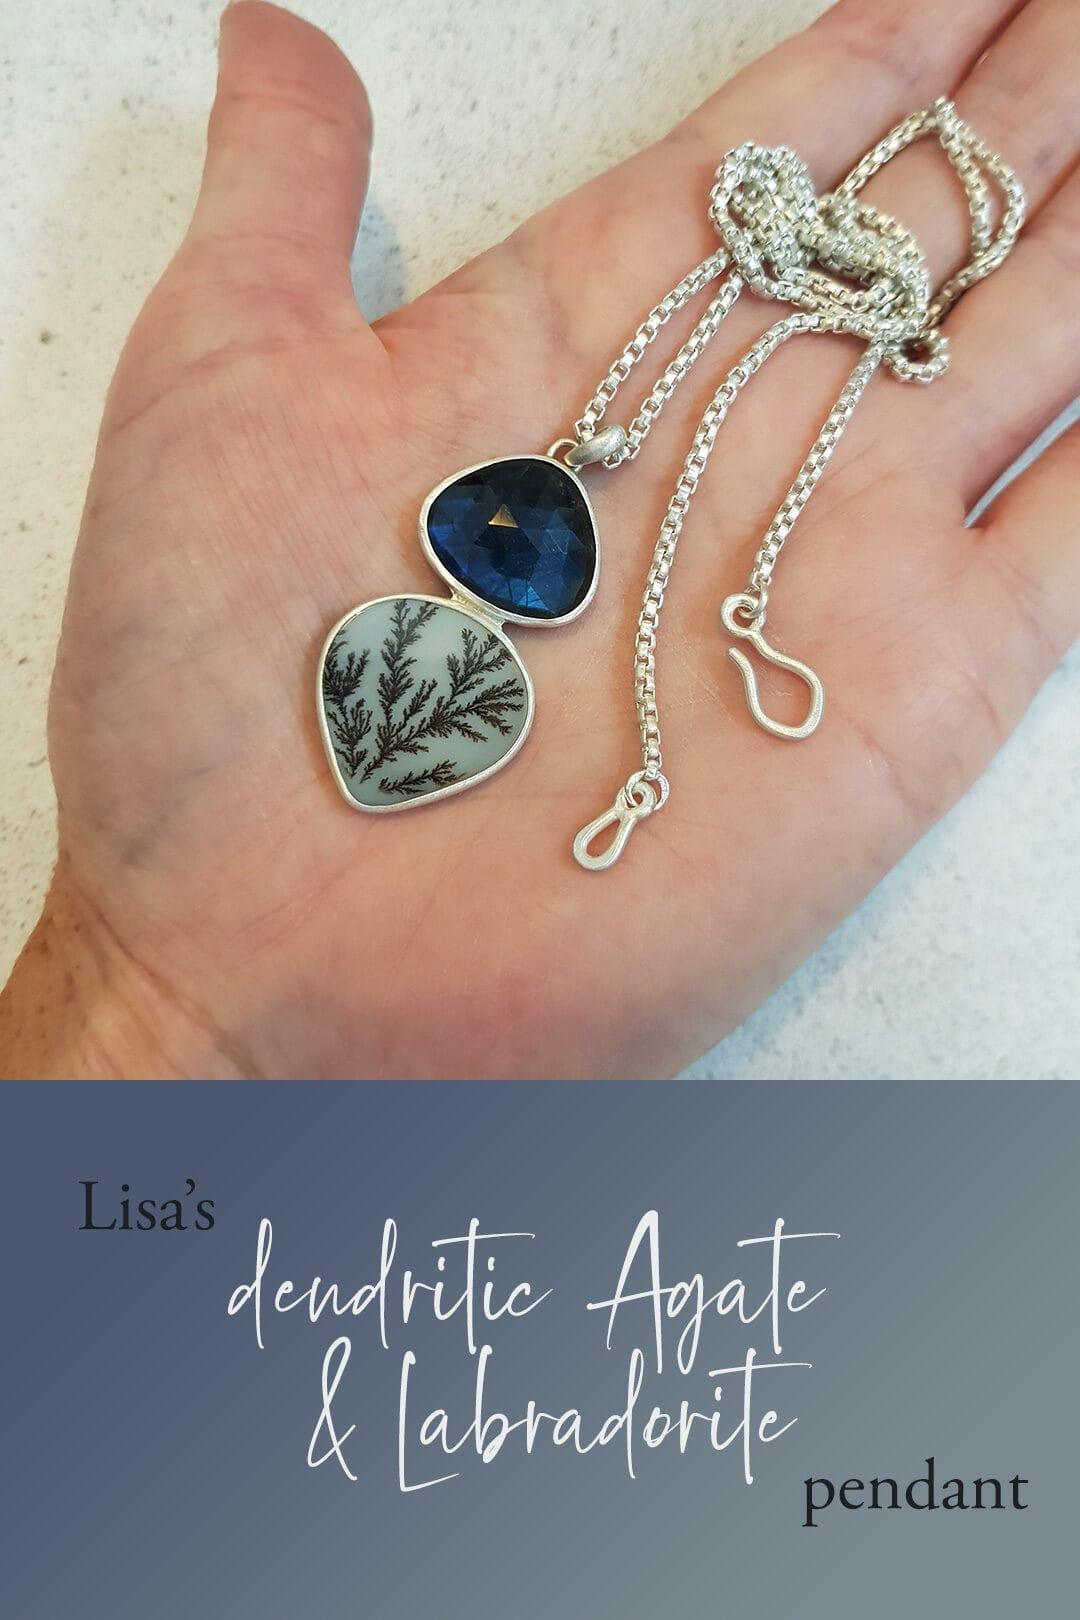 Lisa's dendritic agate and labradorite pendant